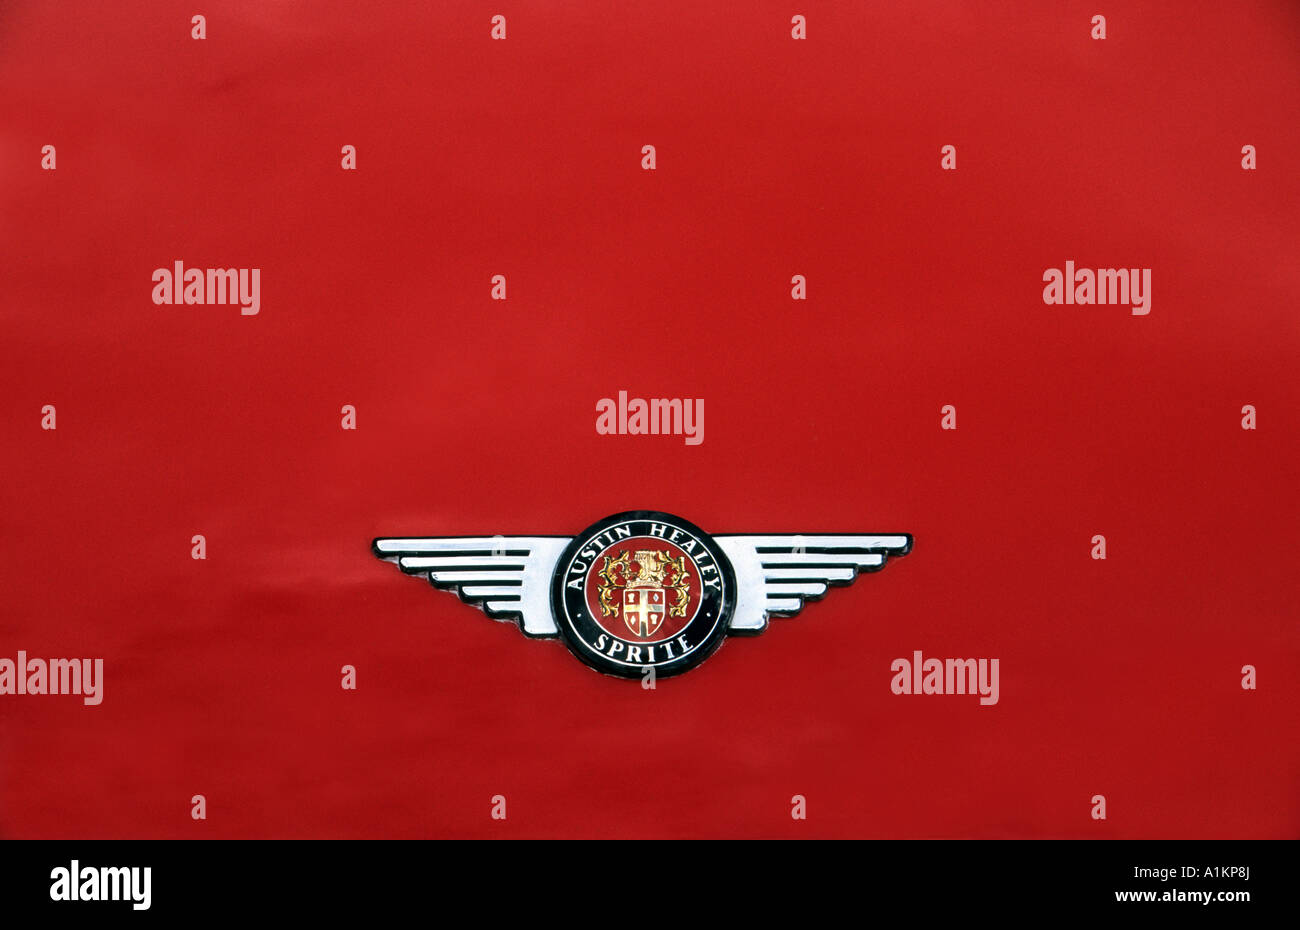 Austin Healey Sprite Of 1967 English Car Manufacturer 1952 To 1972